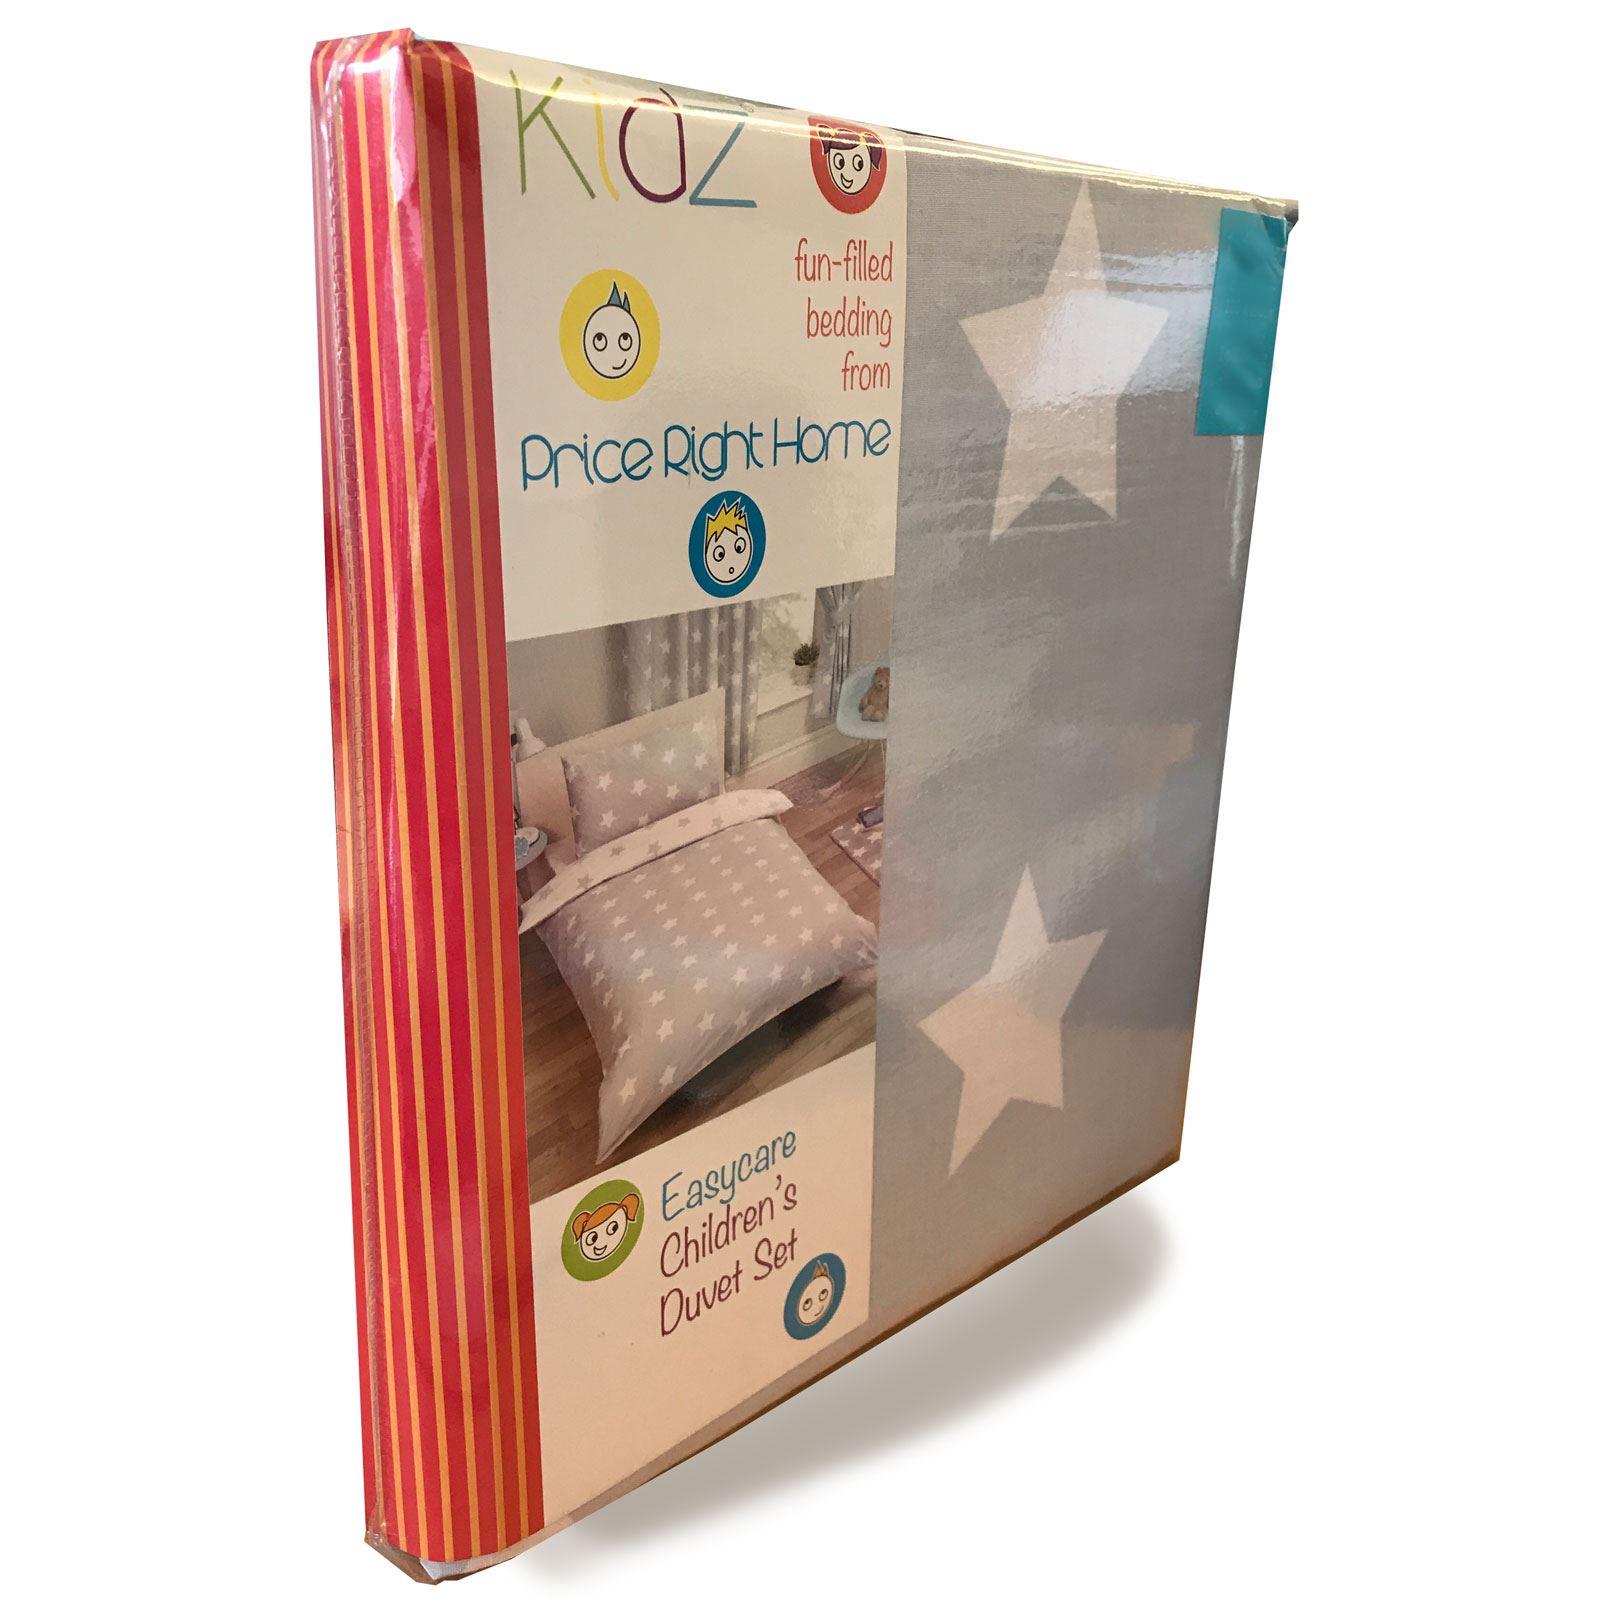 CHARACTER-AND-THEMED-SINGLE-DUVET-COVER-KIDS-BEDDING-SETS-AVENGERS-KITTY-UNICORN thumbnail 56